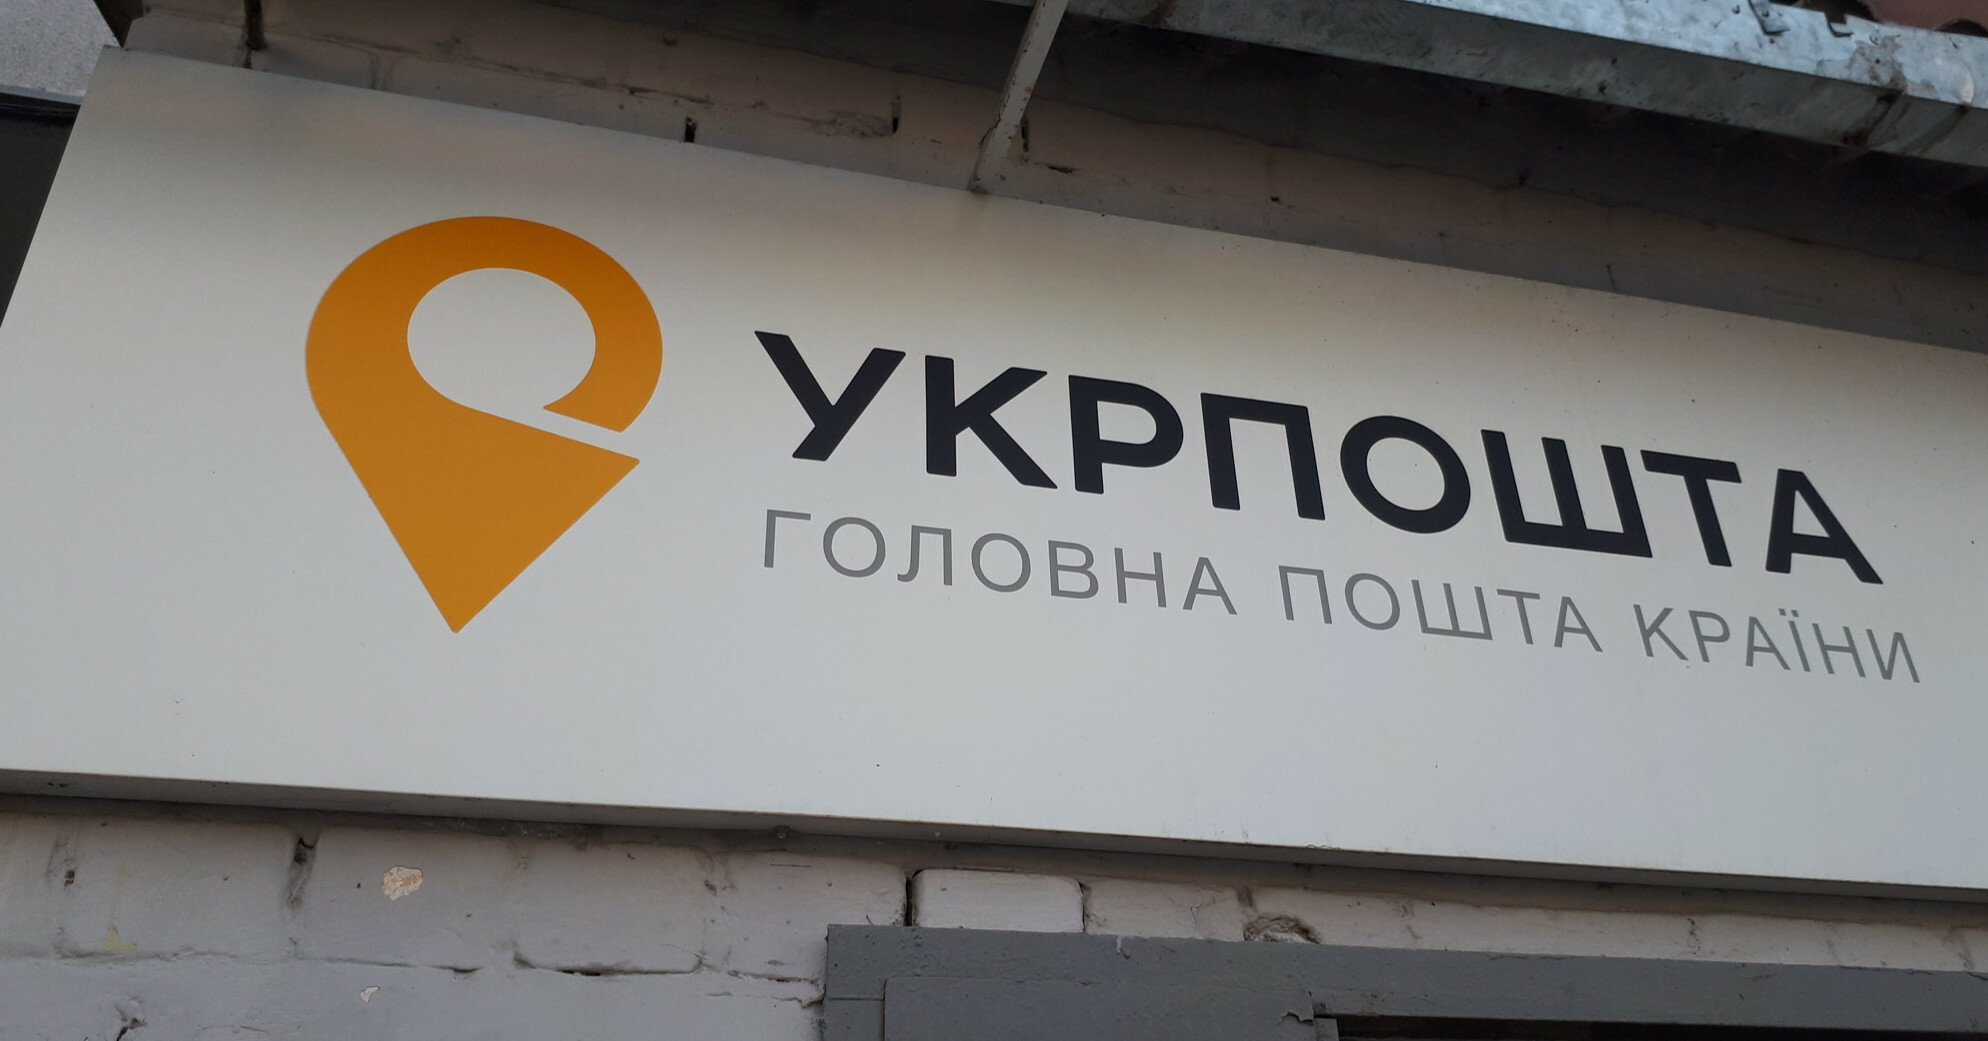 Укрпочта похвасталась продажей здания церкви УПЦ МП